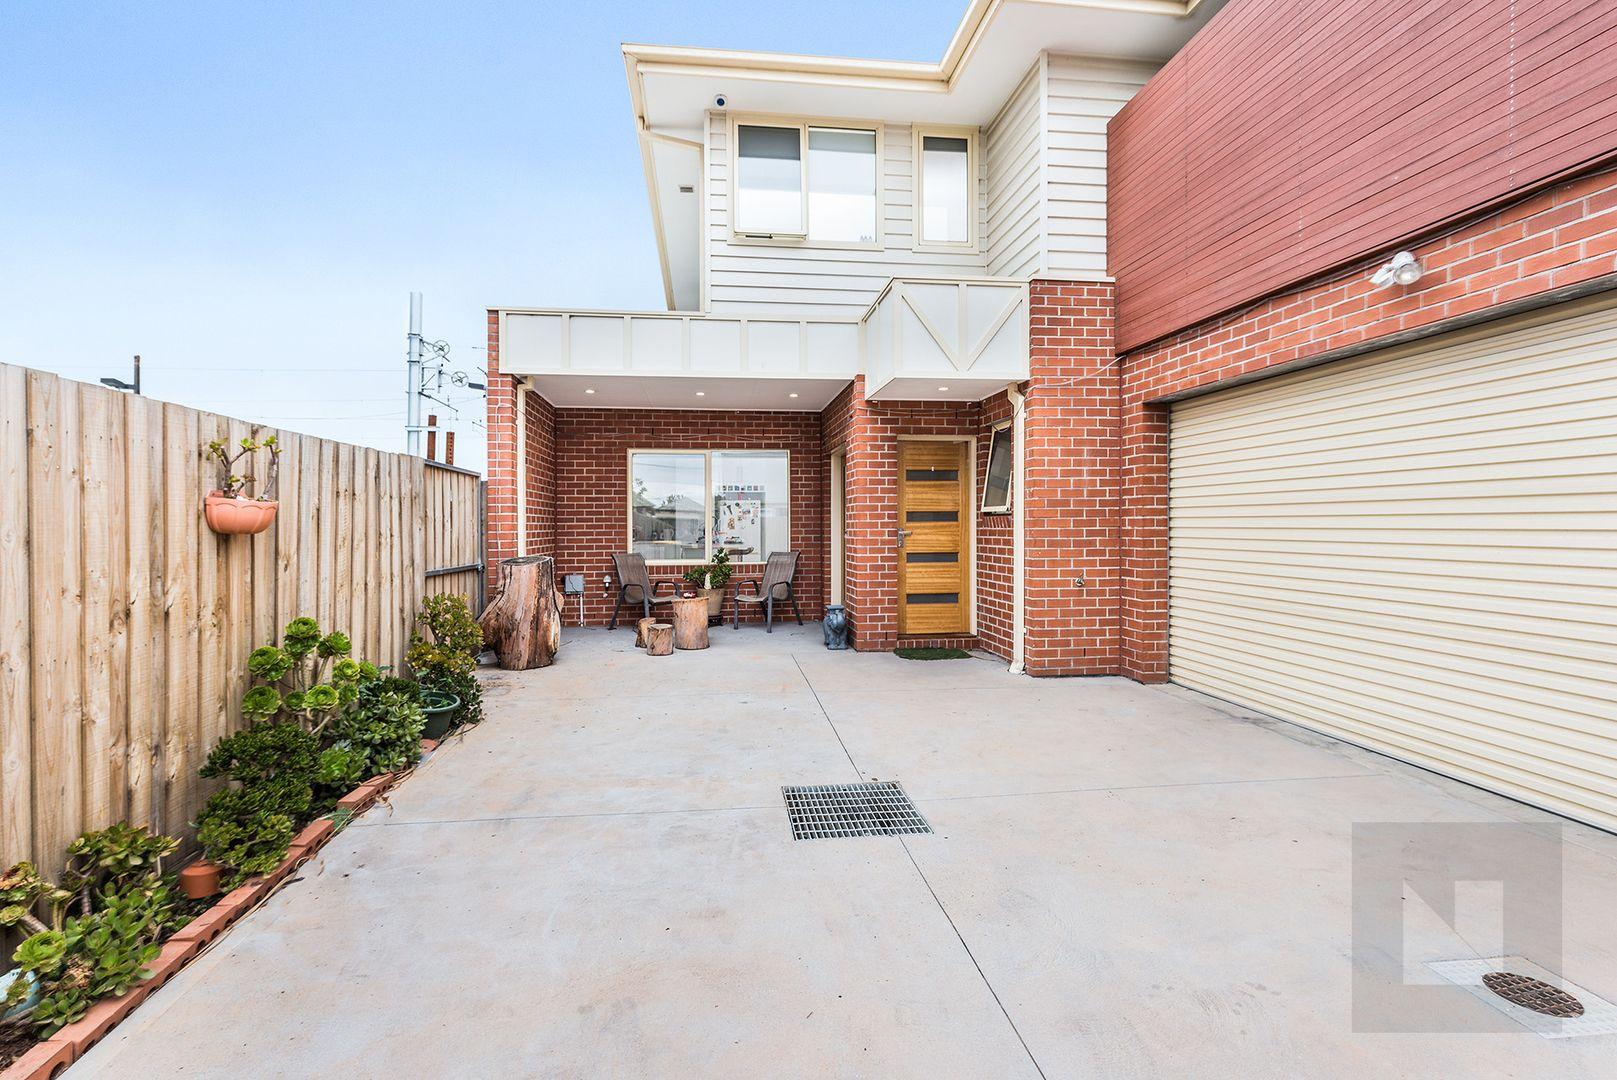 2/19 Errol Street, Footscray VIC 3011, Image 0